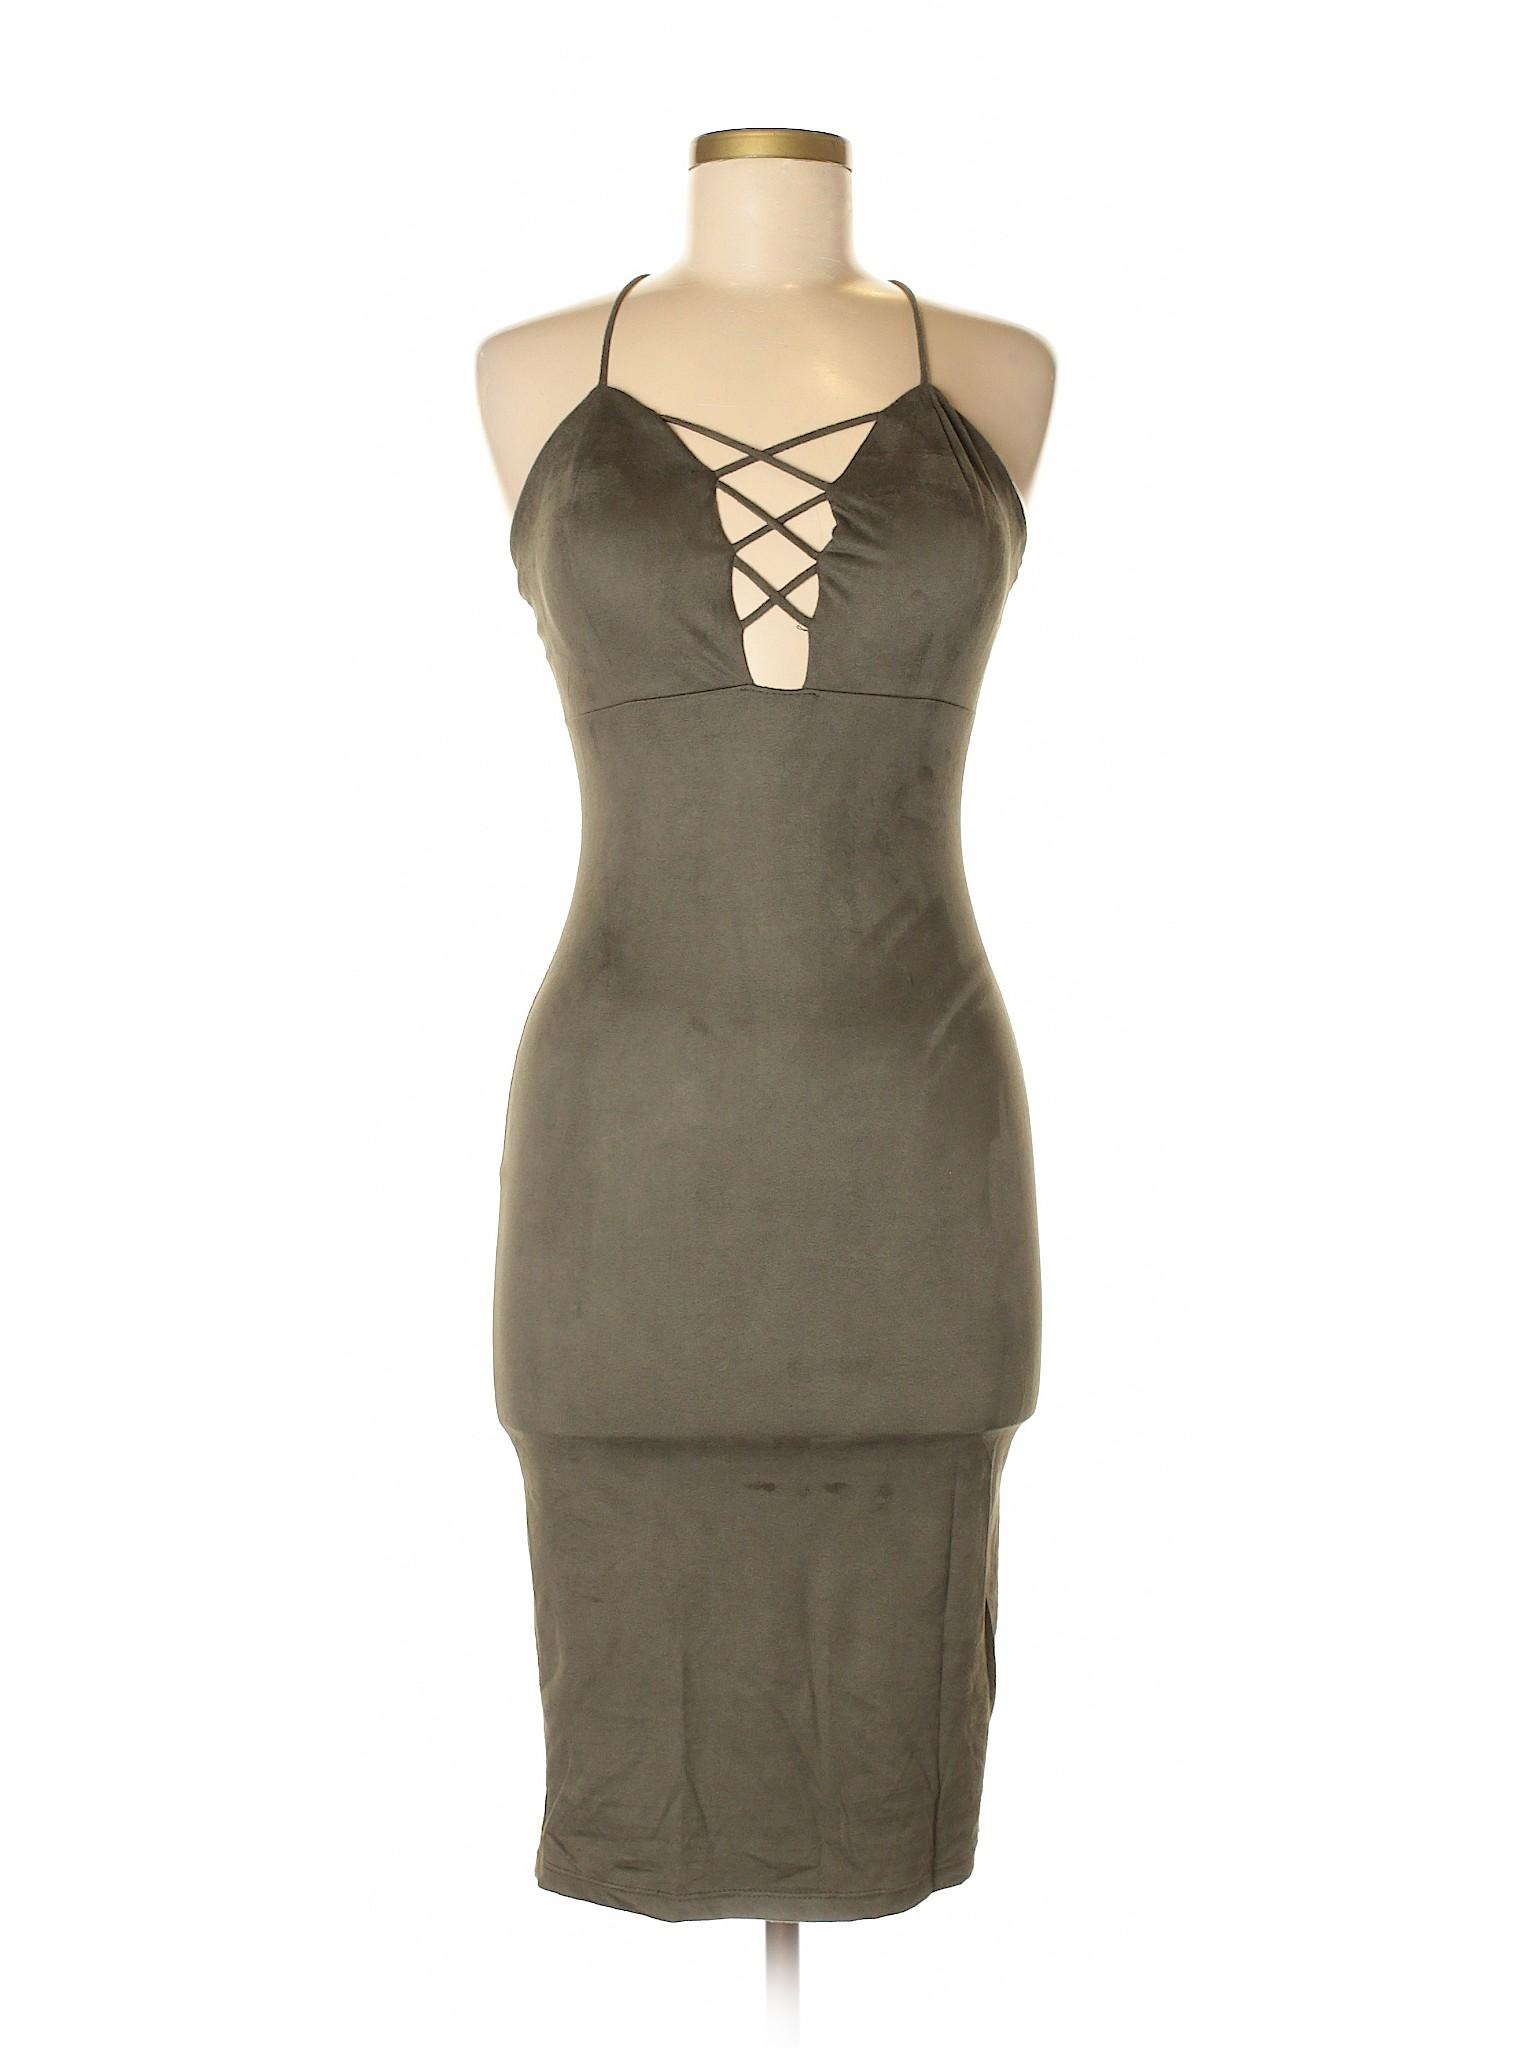 Boutique Boutique Codigo winter Casual Casual Codigo winter winter Boutique Dress Dress qnBHXF7txB